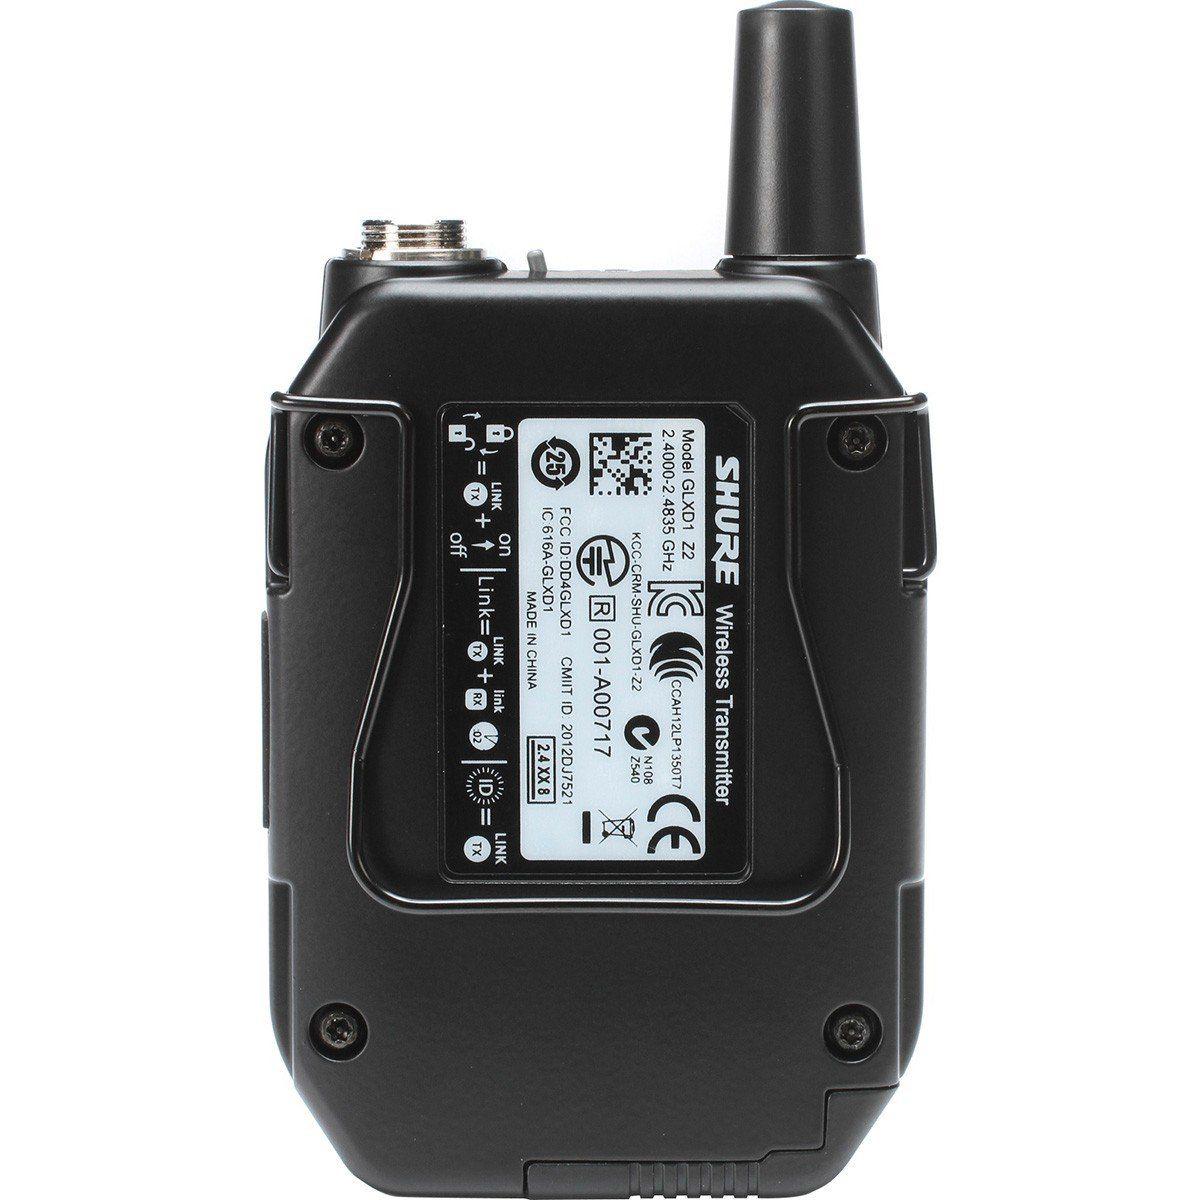 Shure GLXD14/WL93 Microfone de Lapela Shure GLXD14 WL93 para Teatros e Gravações